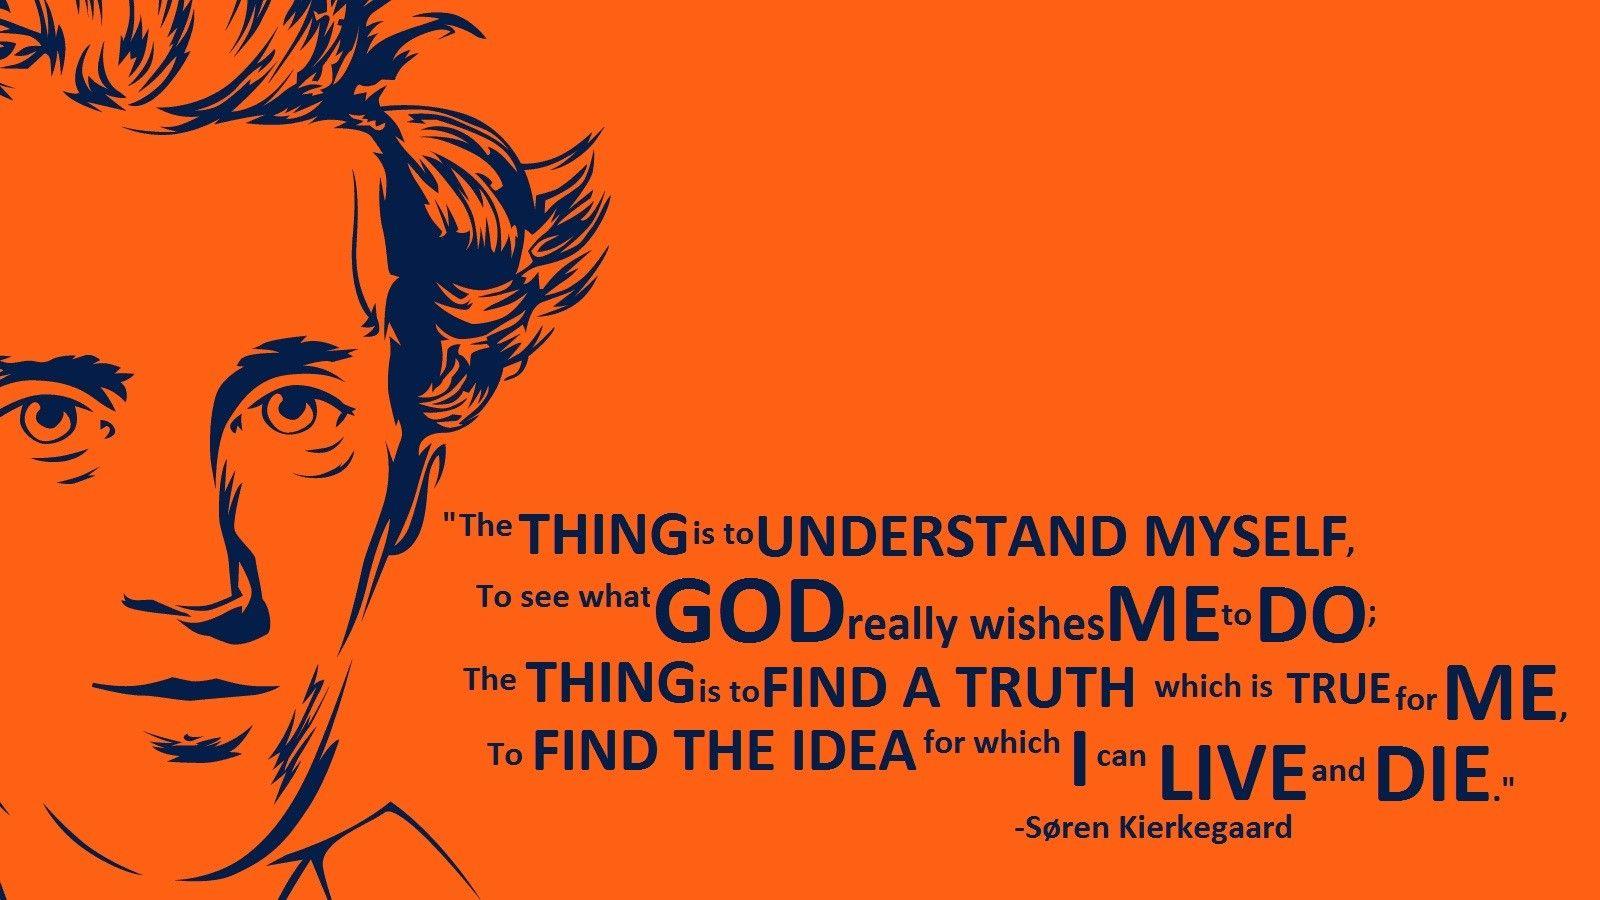 Favorite philosopher and philosophy?